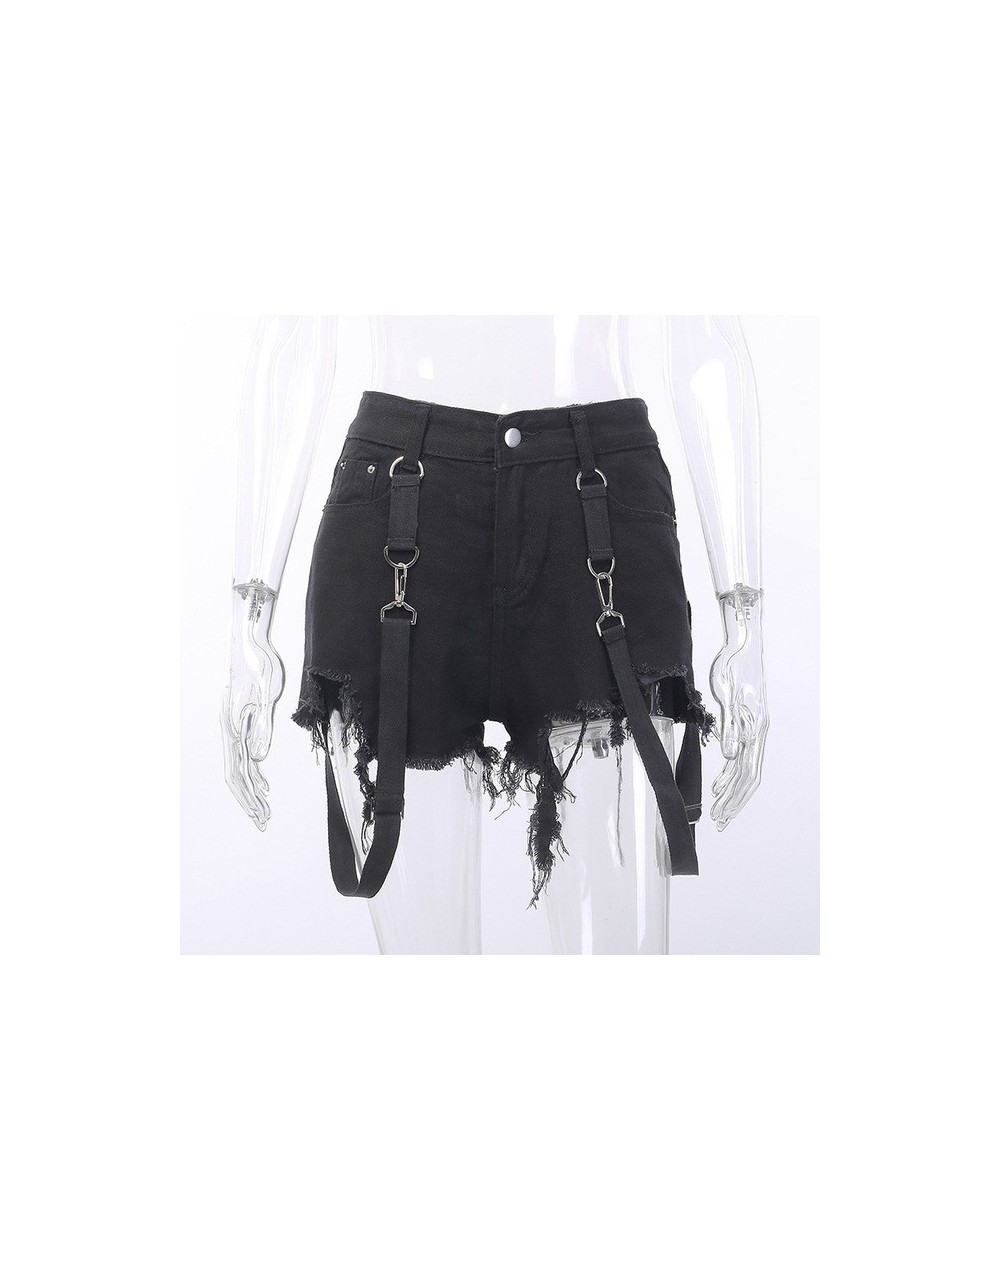 High Waist Hole Jeans Shorts Women Summer Harajuku Gothic Streetwear Shorts Black Fashion Punk Strap Shorts for Girls - Shor...